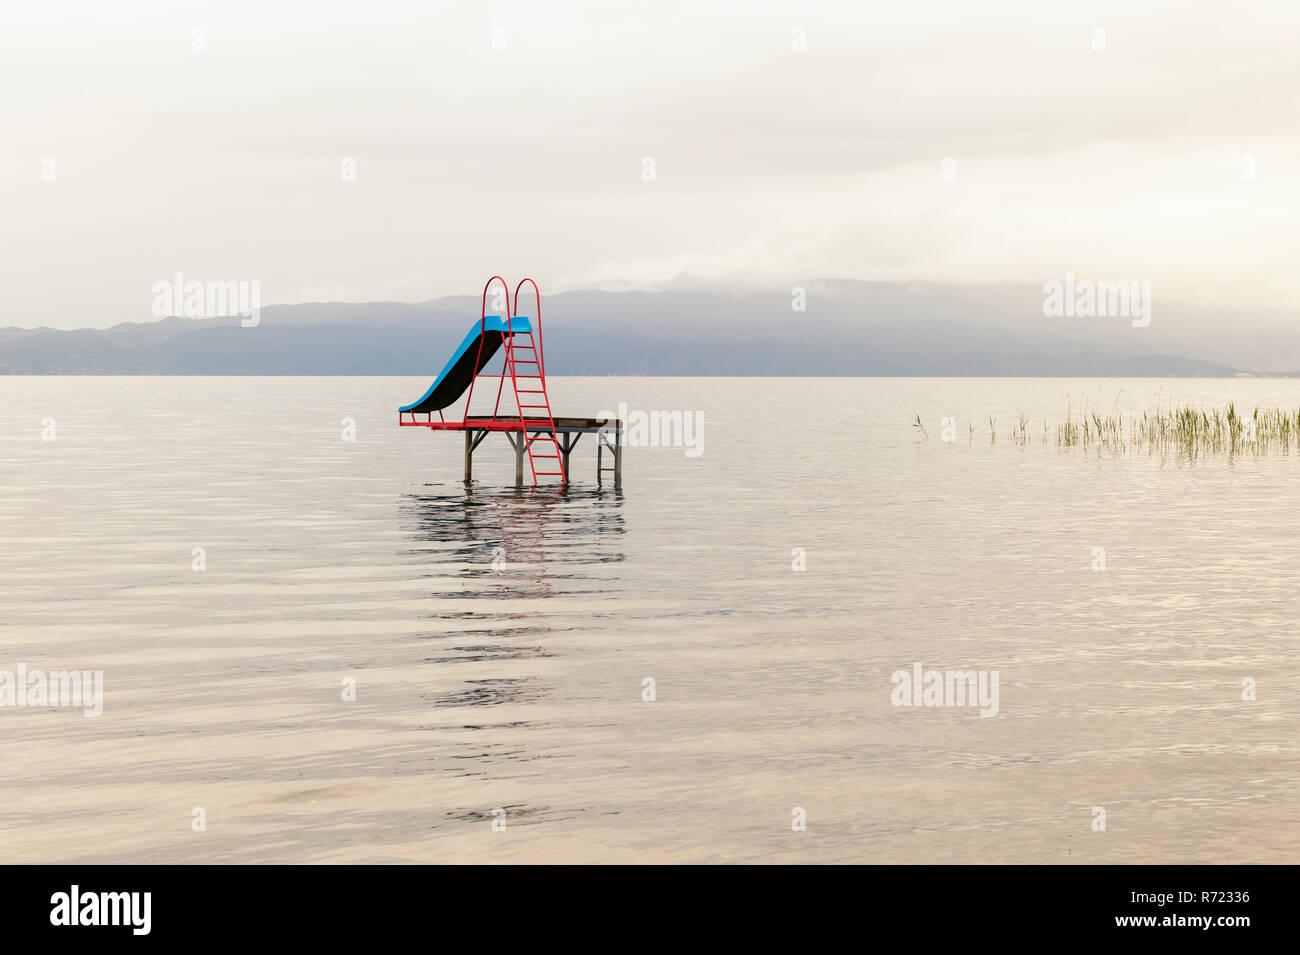 Water slide in Lake Ohrid, Macedonia - Stock Image